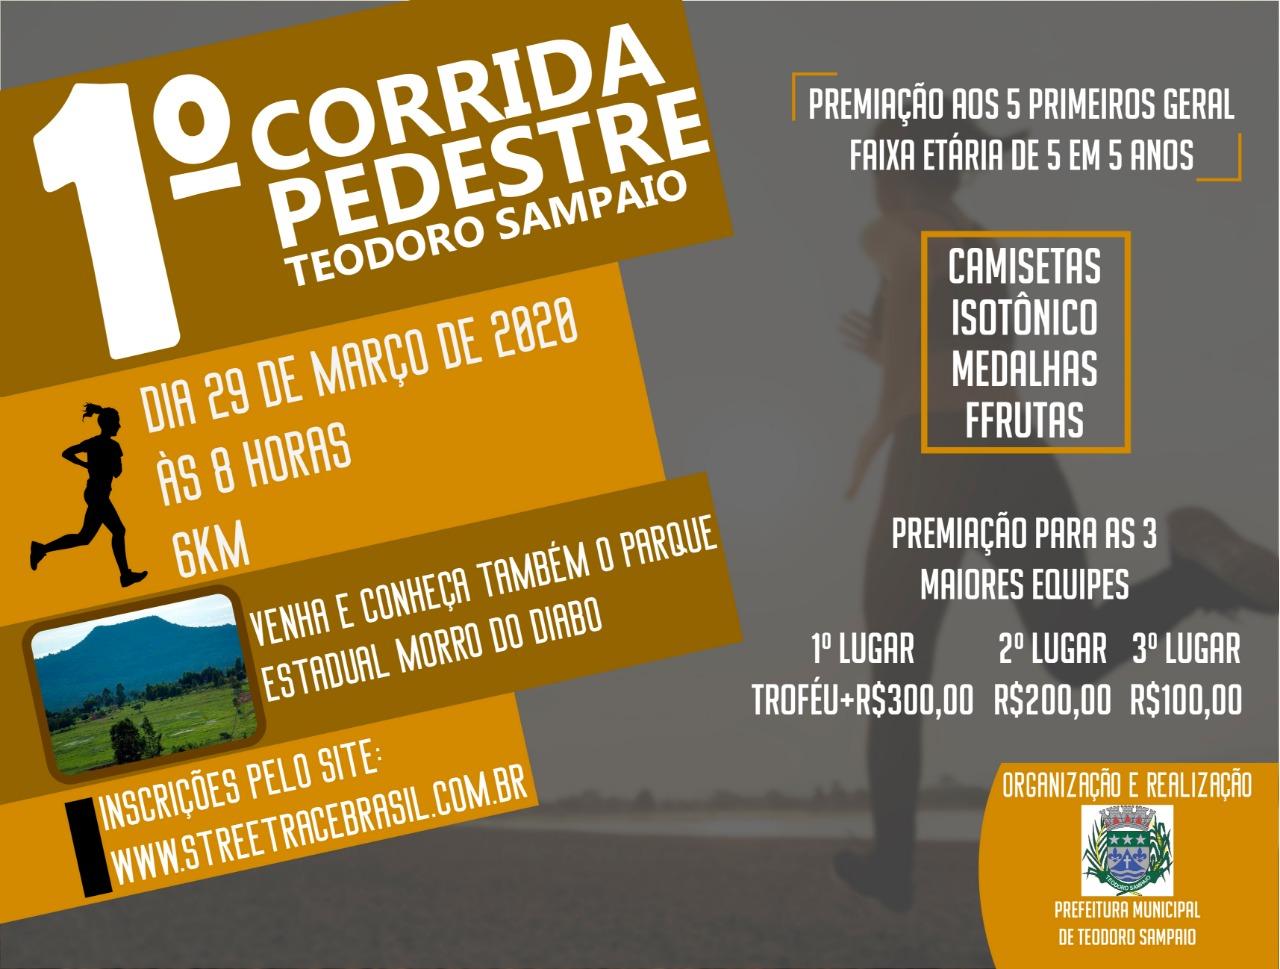 1º CORRIDA PEDESTRE DE TEODORO SAMPAIO